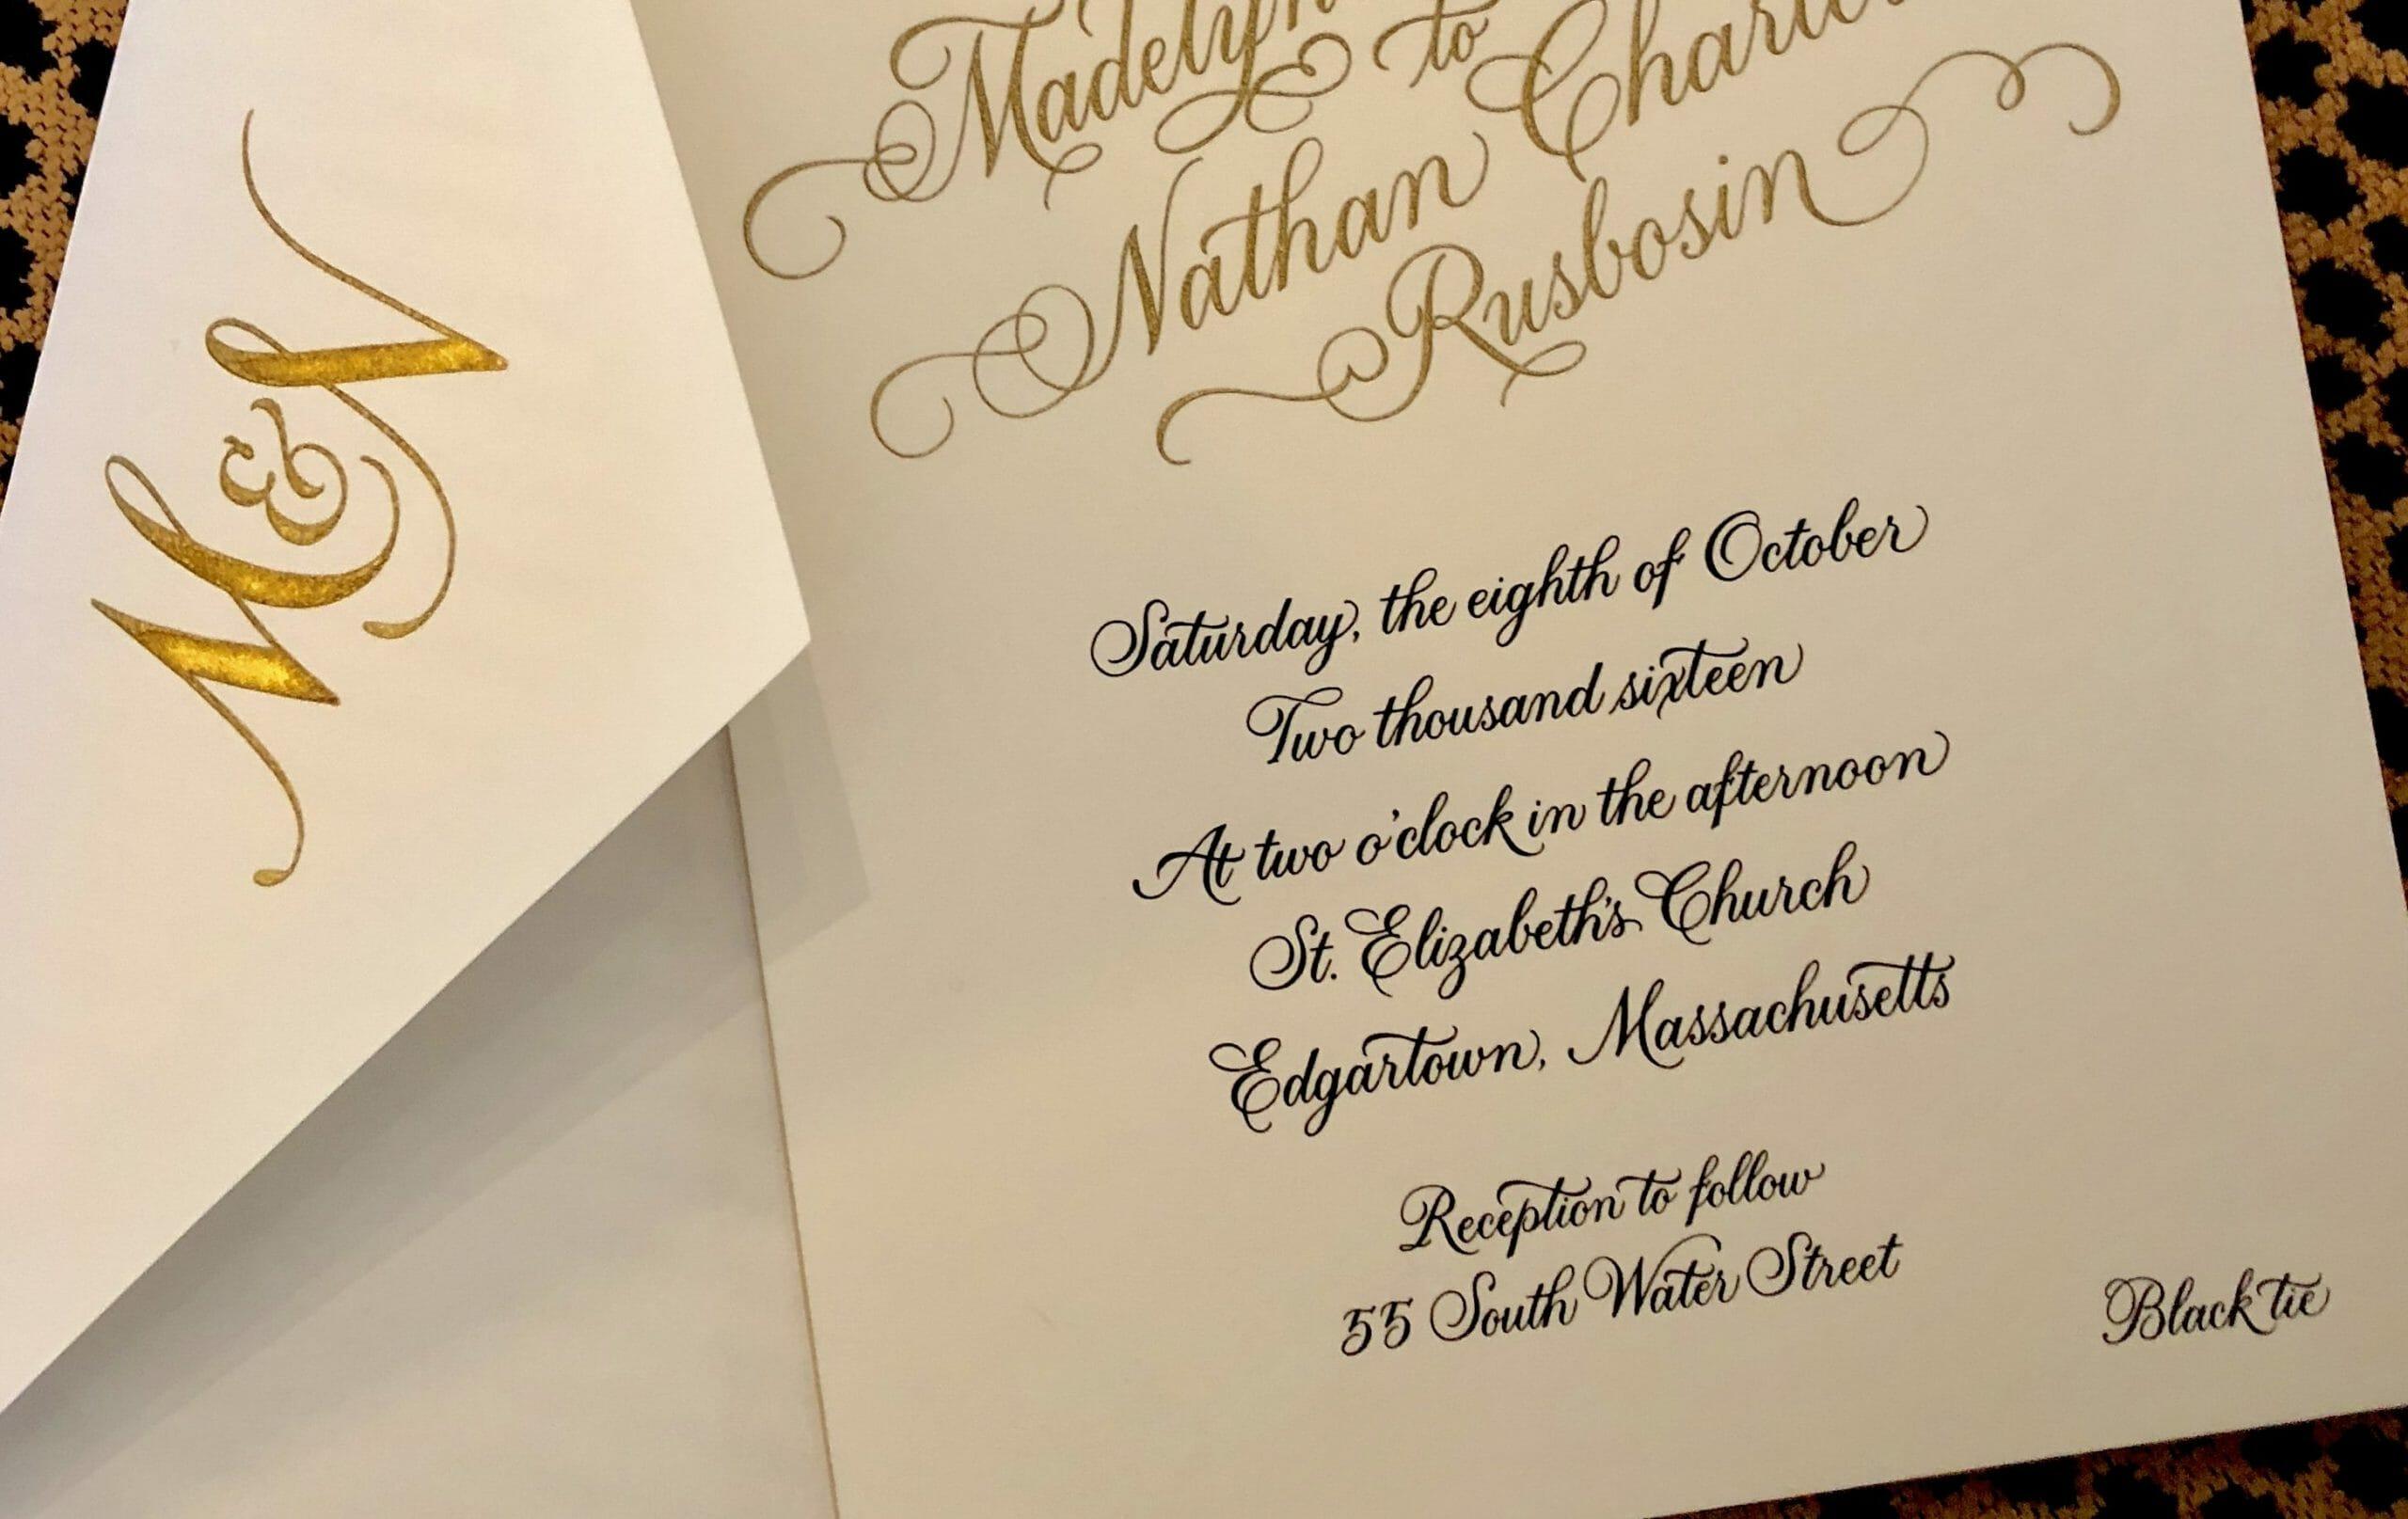 Close-up of elegant cursive fonts on wedding invitation